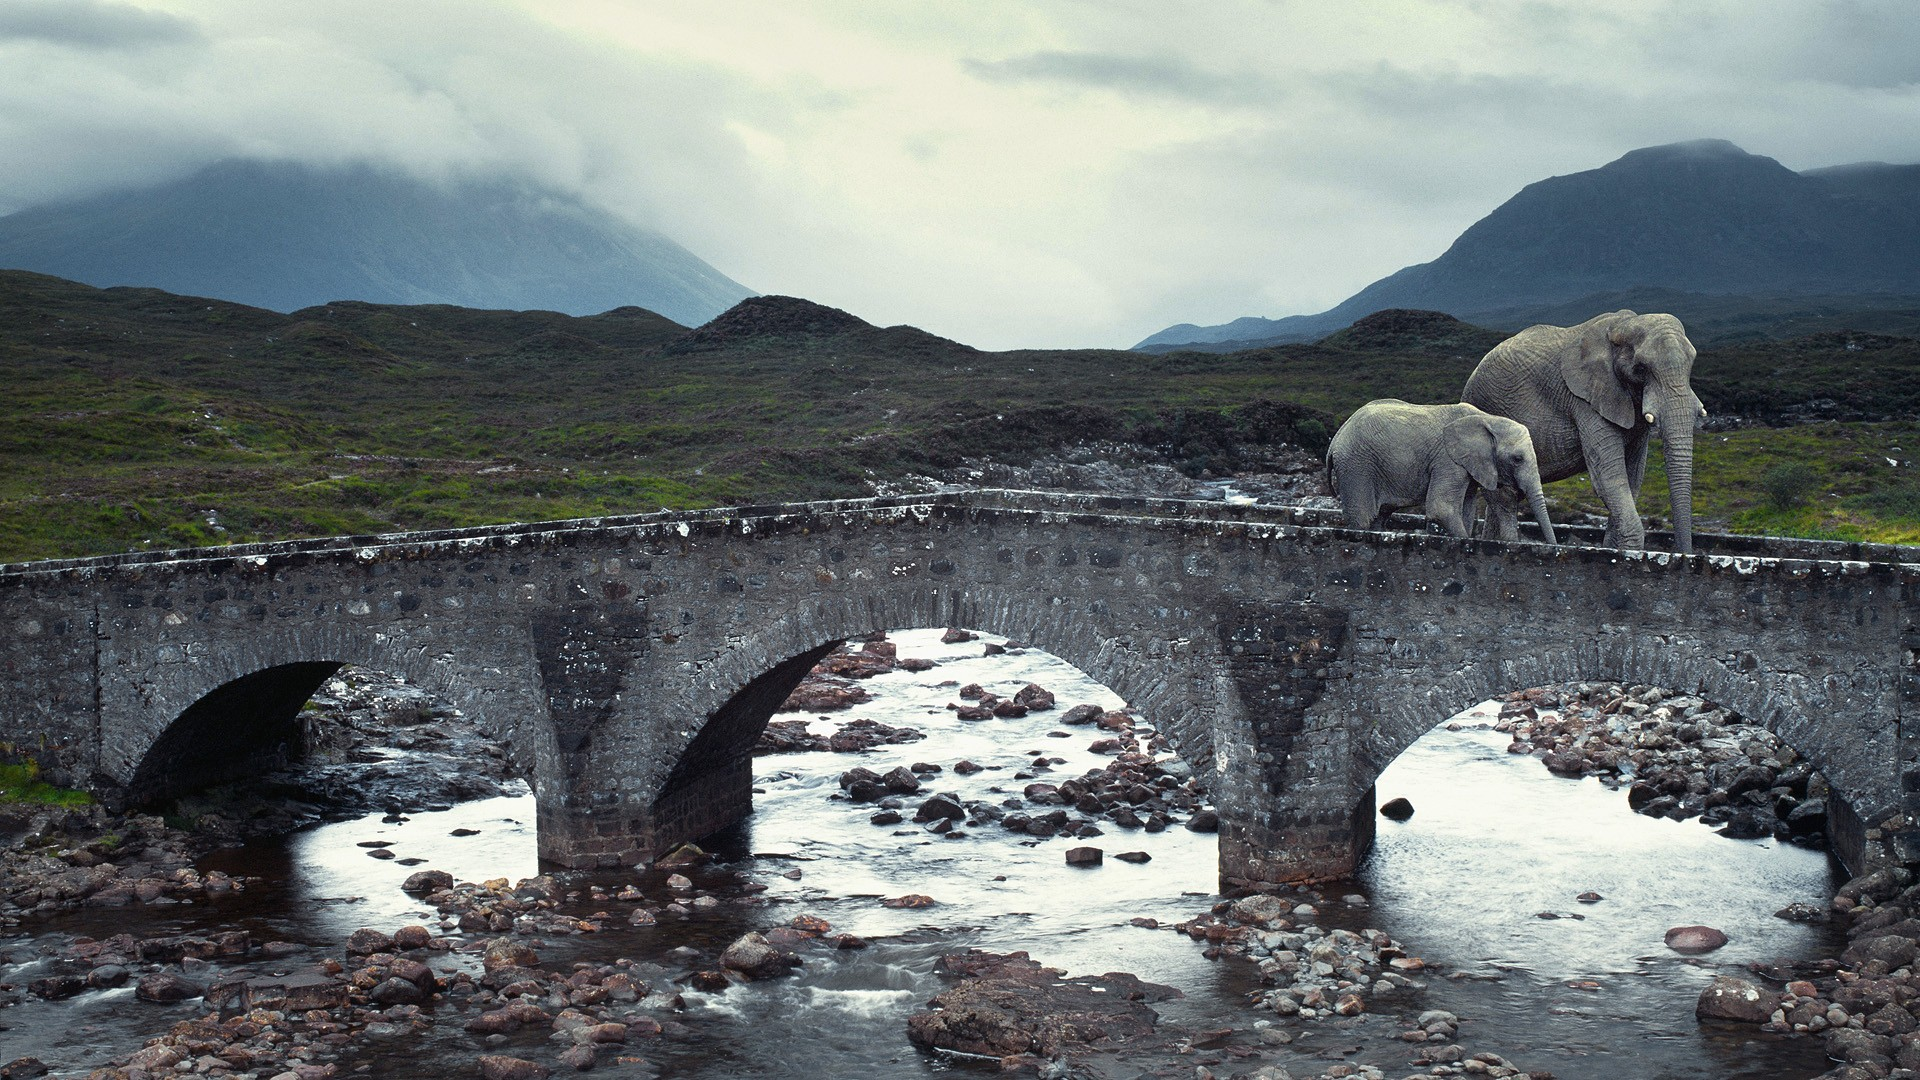 Elephant on Bridge